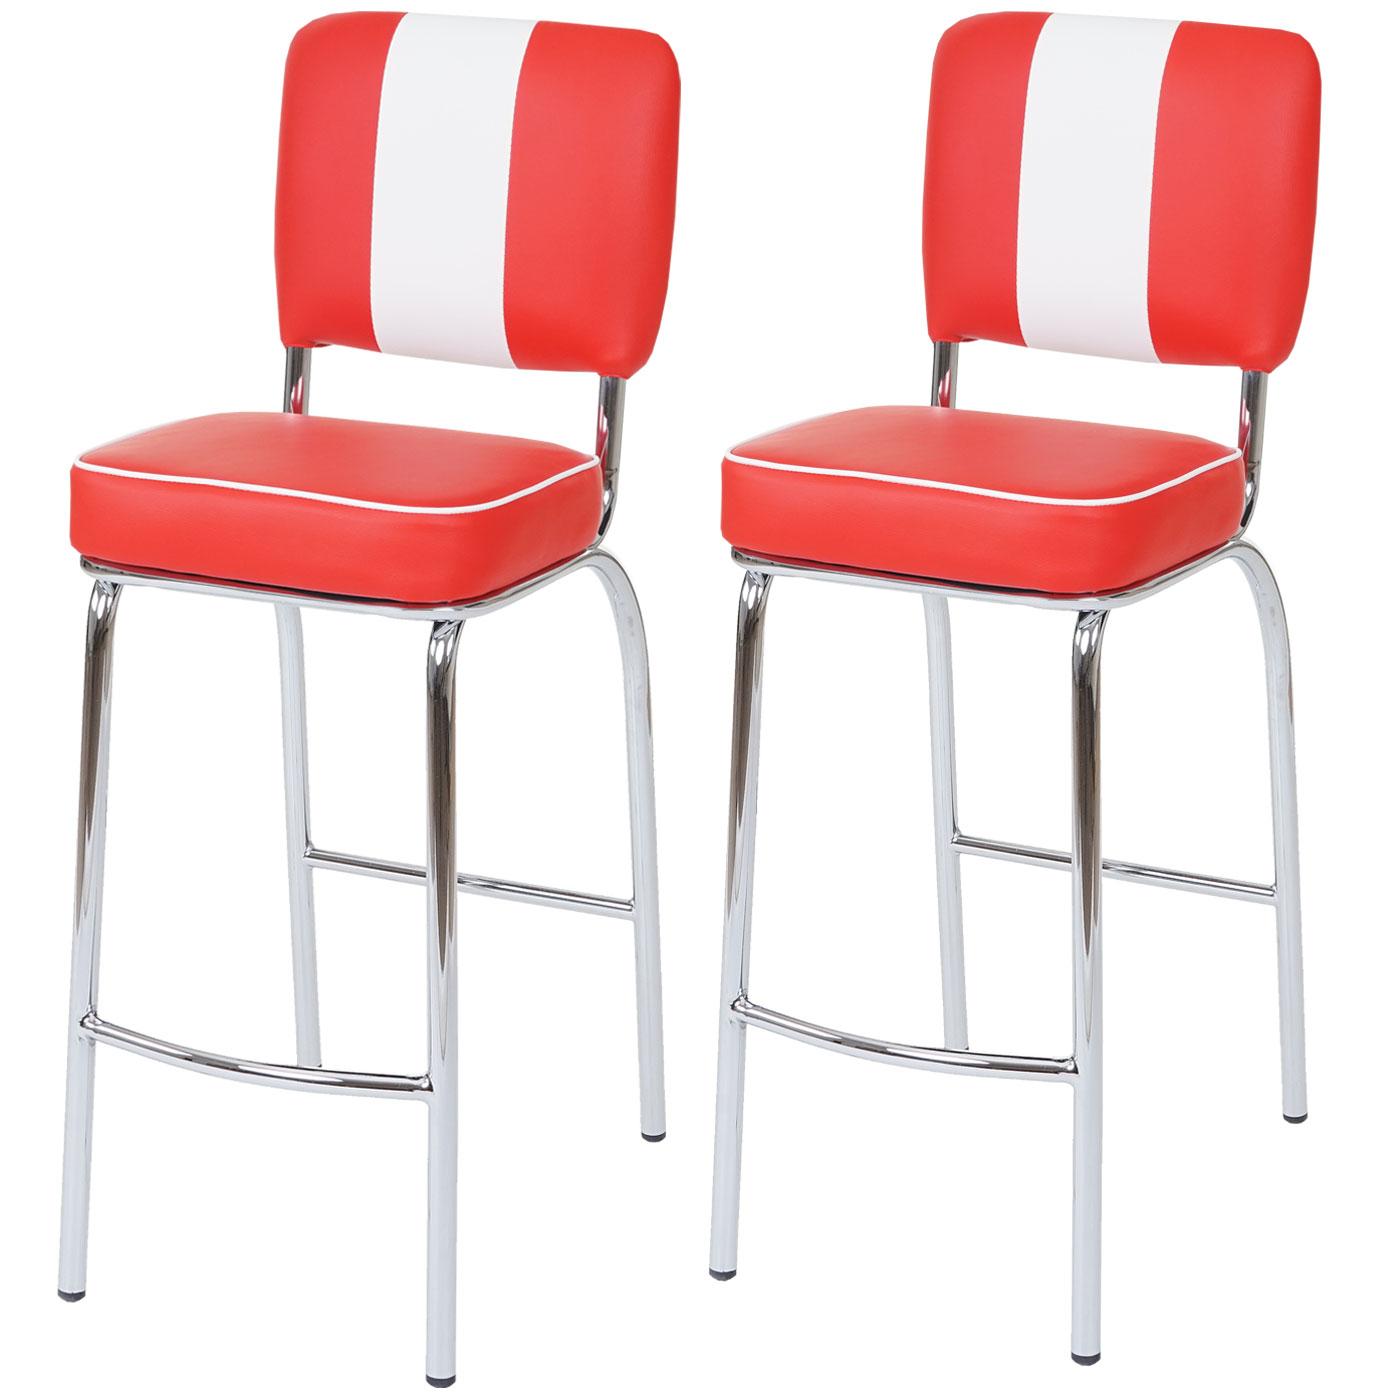 2x barhocker avellino barstuhl tresenhocker retro 50er jahre design kunstleder rot wei. Black Bedroom Furniture Sets. Home Design Ideas